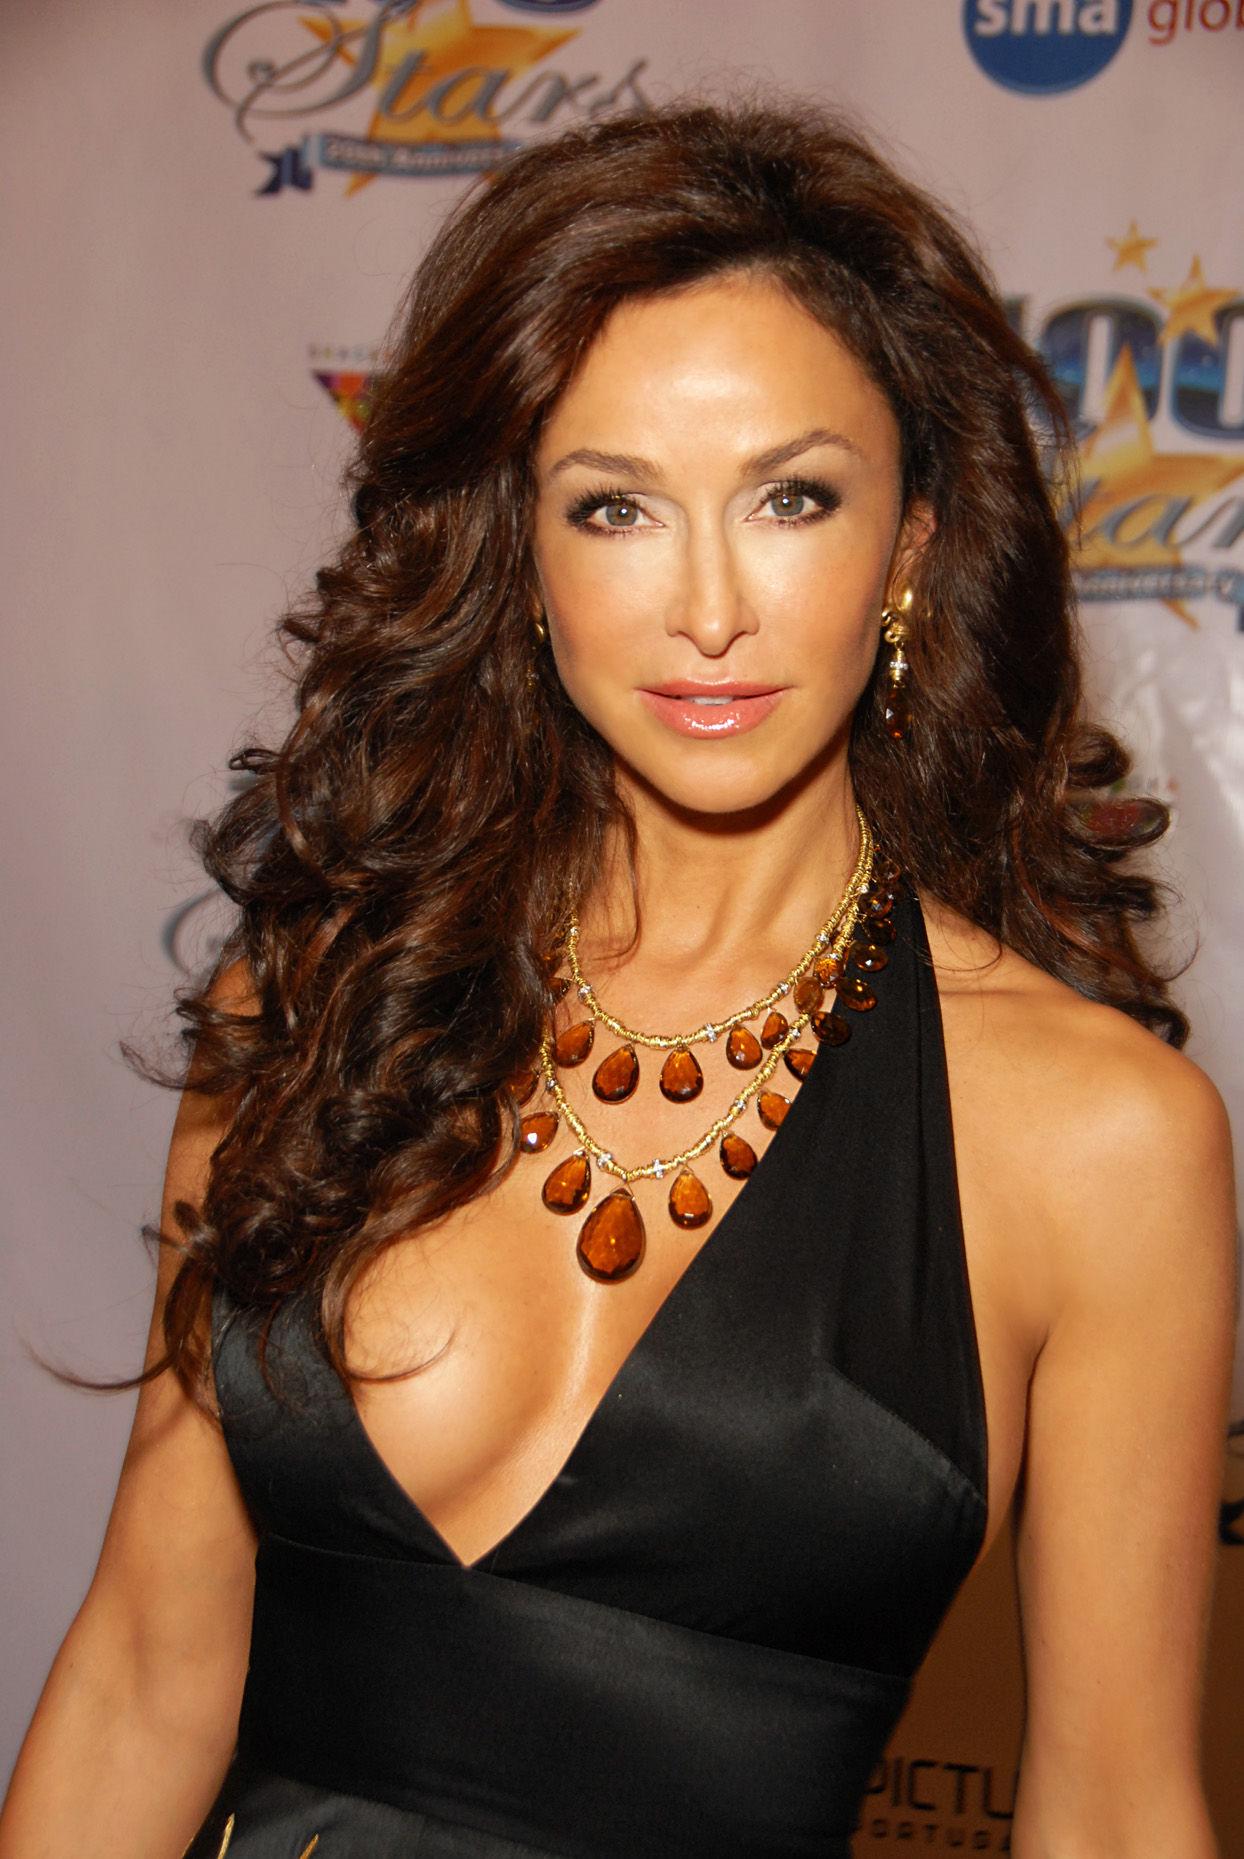 Photo of Sofia Milos: Italian/Greek actress